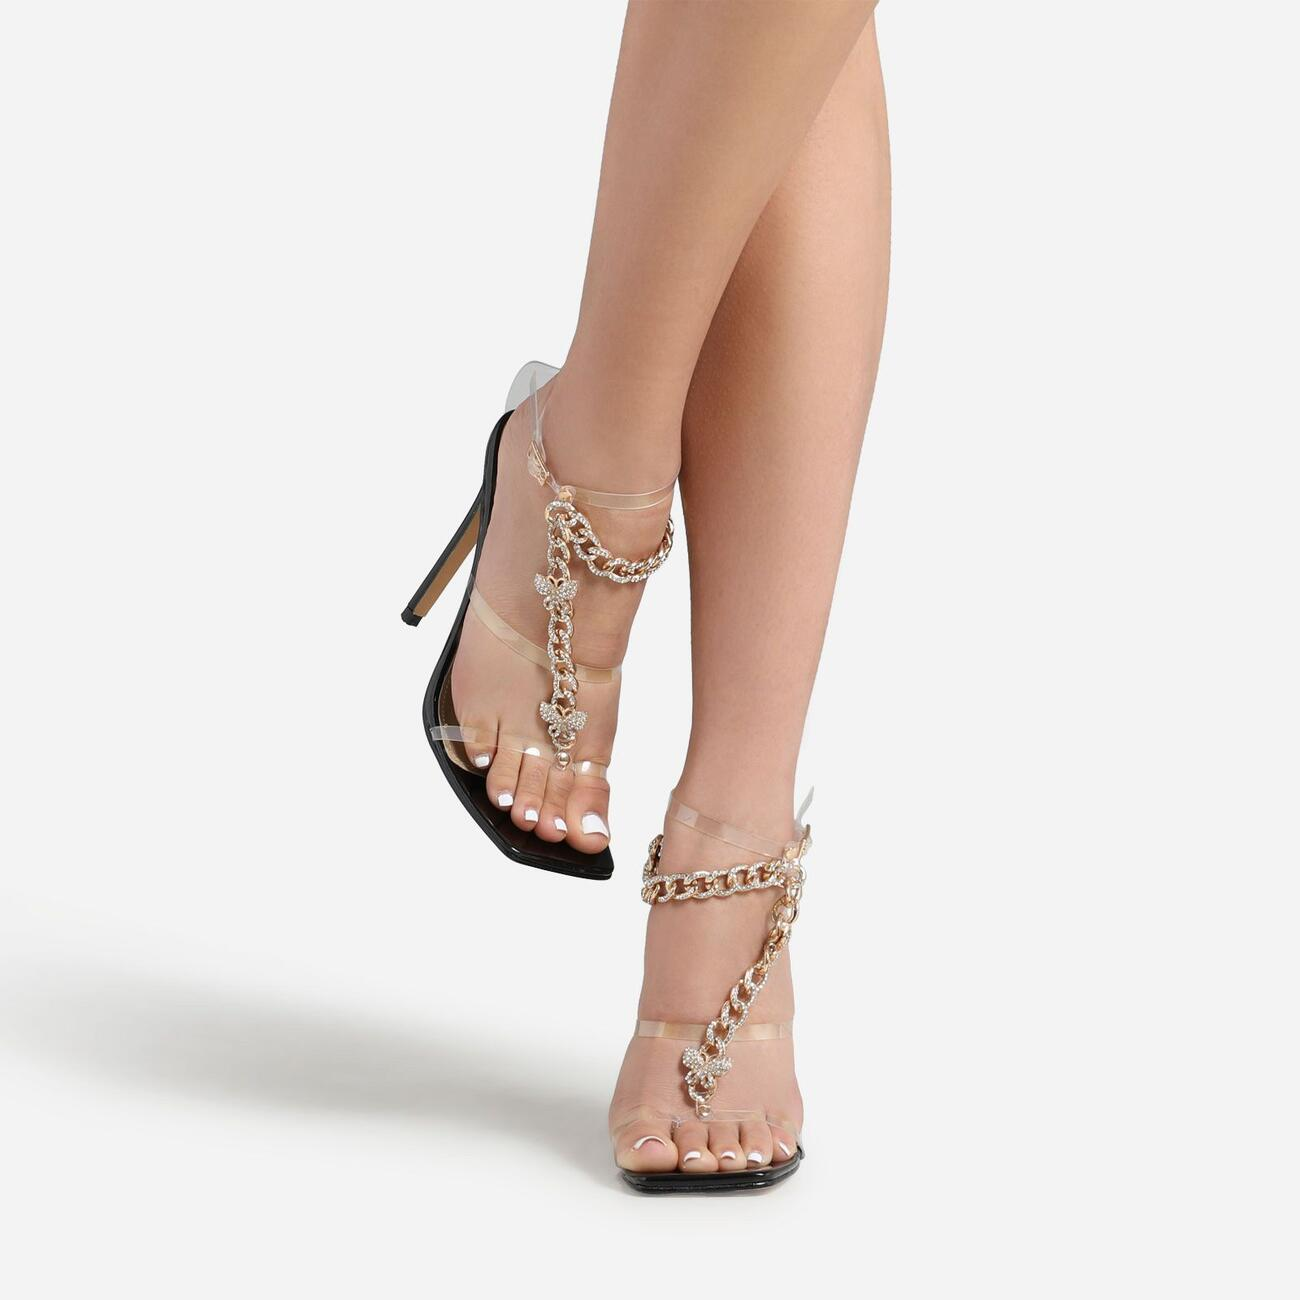 Cabana Diamante Gem Chain Detail Square Toe Heel In Black Patent Image 1